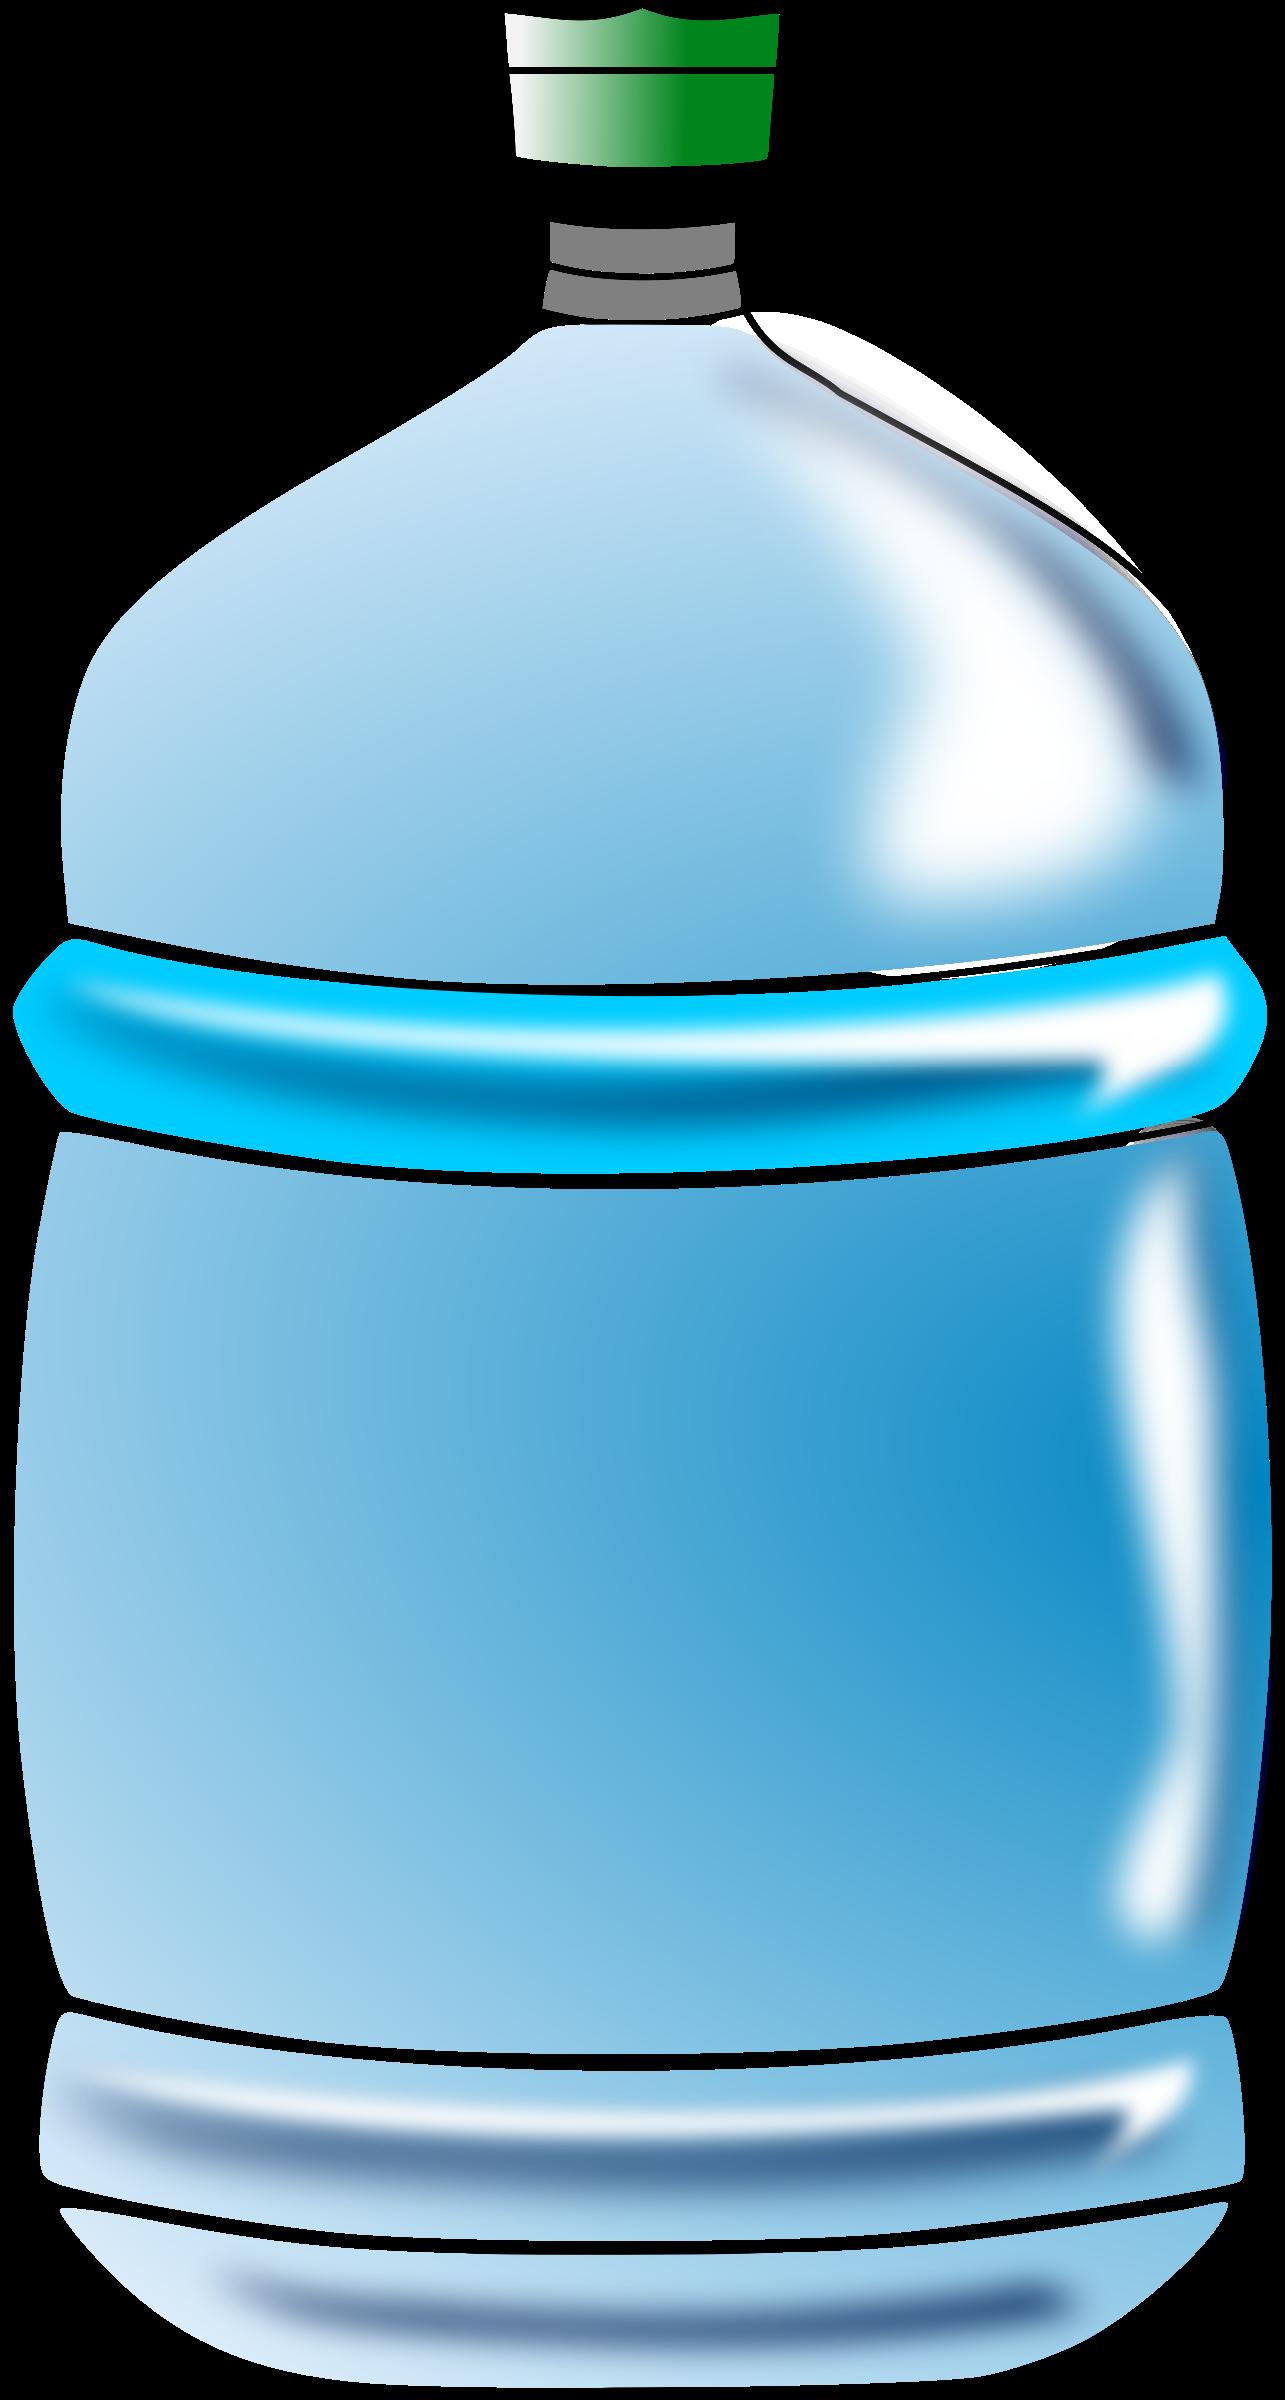 Water Bottle By Cprostire-water bottle by cprostire-7